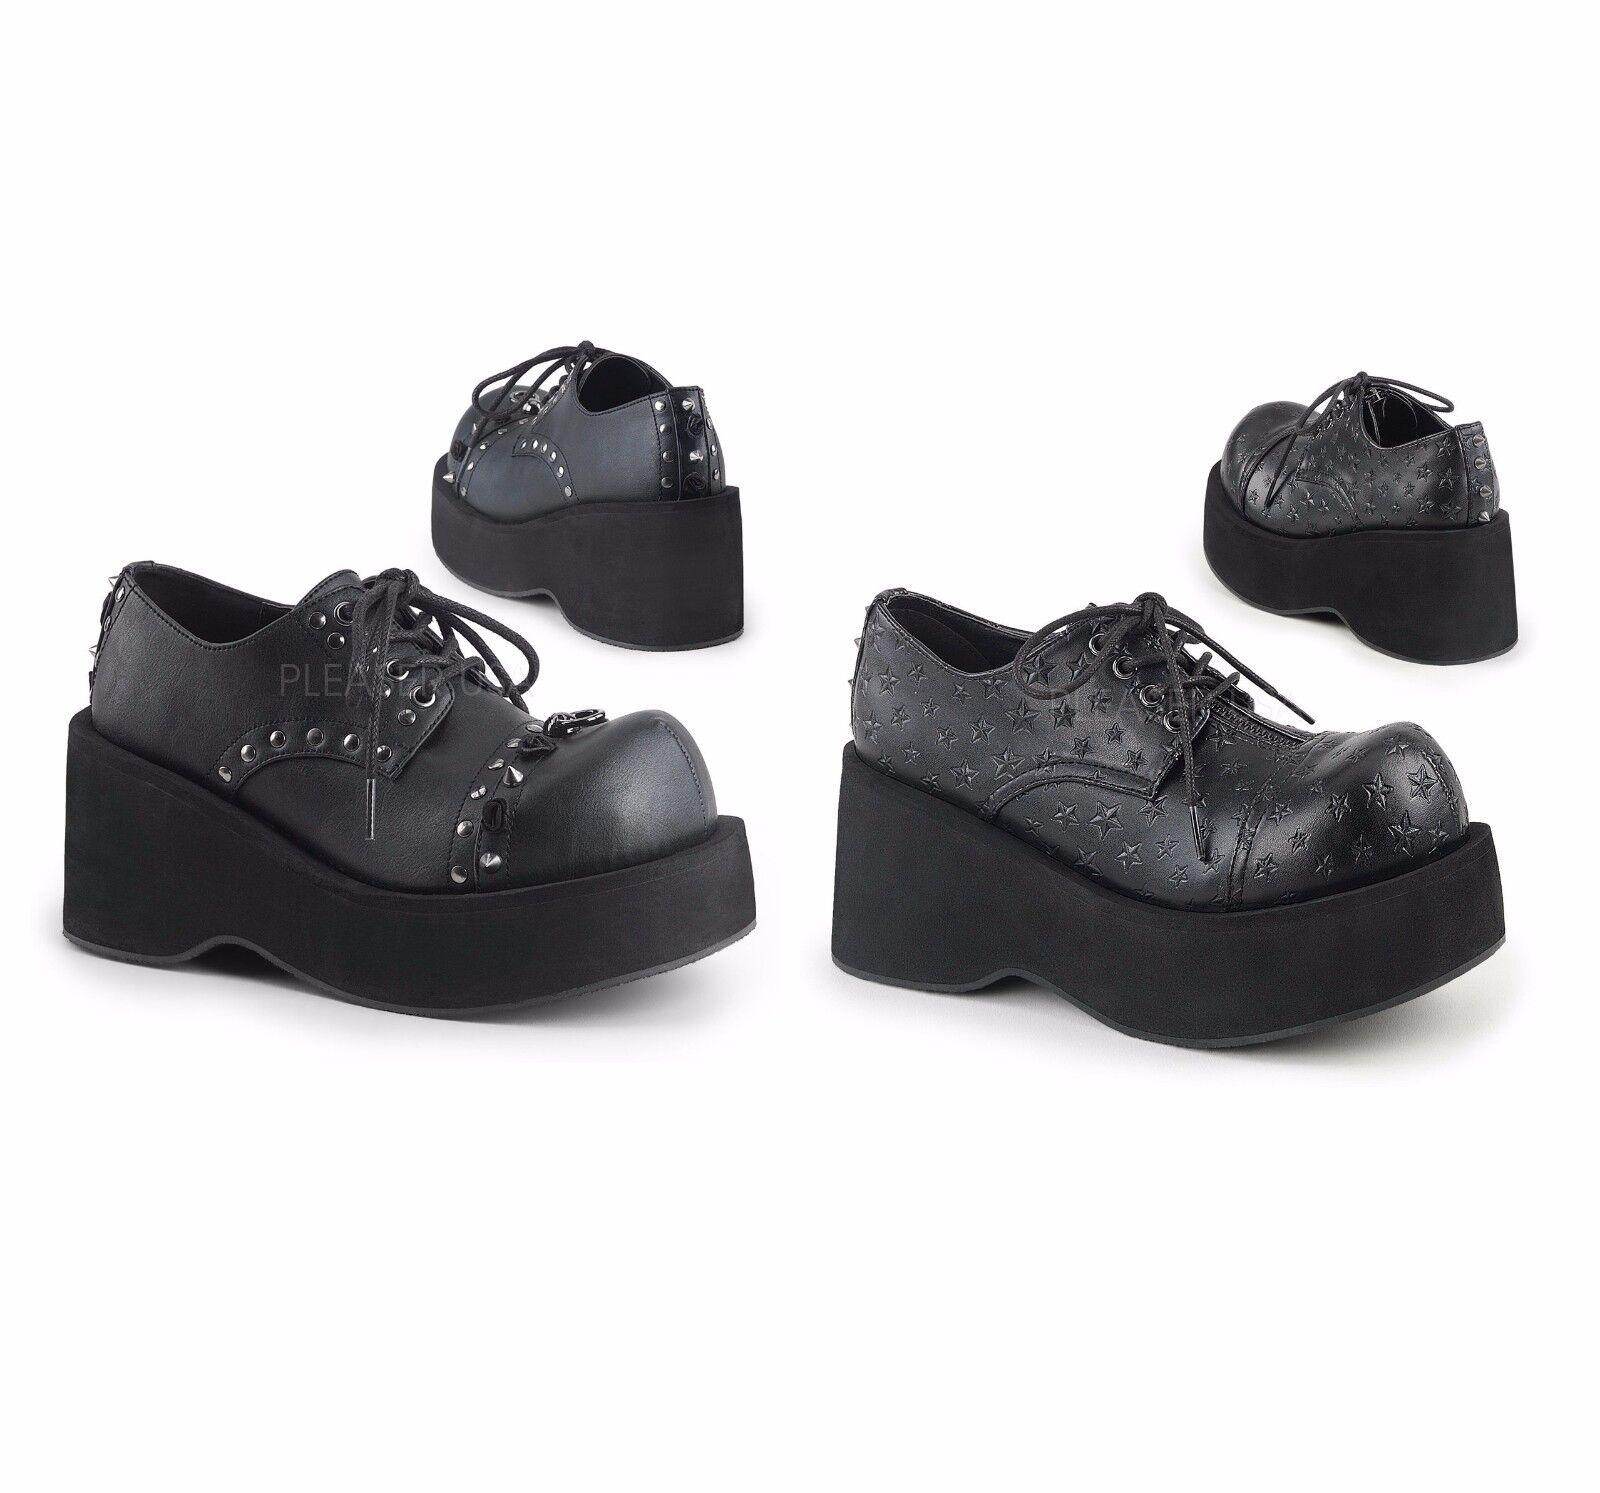 Demonia DANK 111 Schuhe Up Damenschuhe Platform Lace Up Schuhe Oxford Schuhe ... 87c742